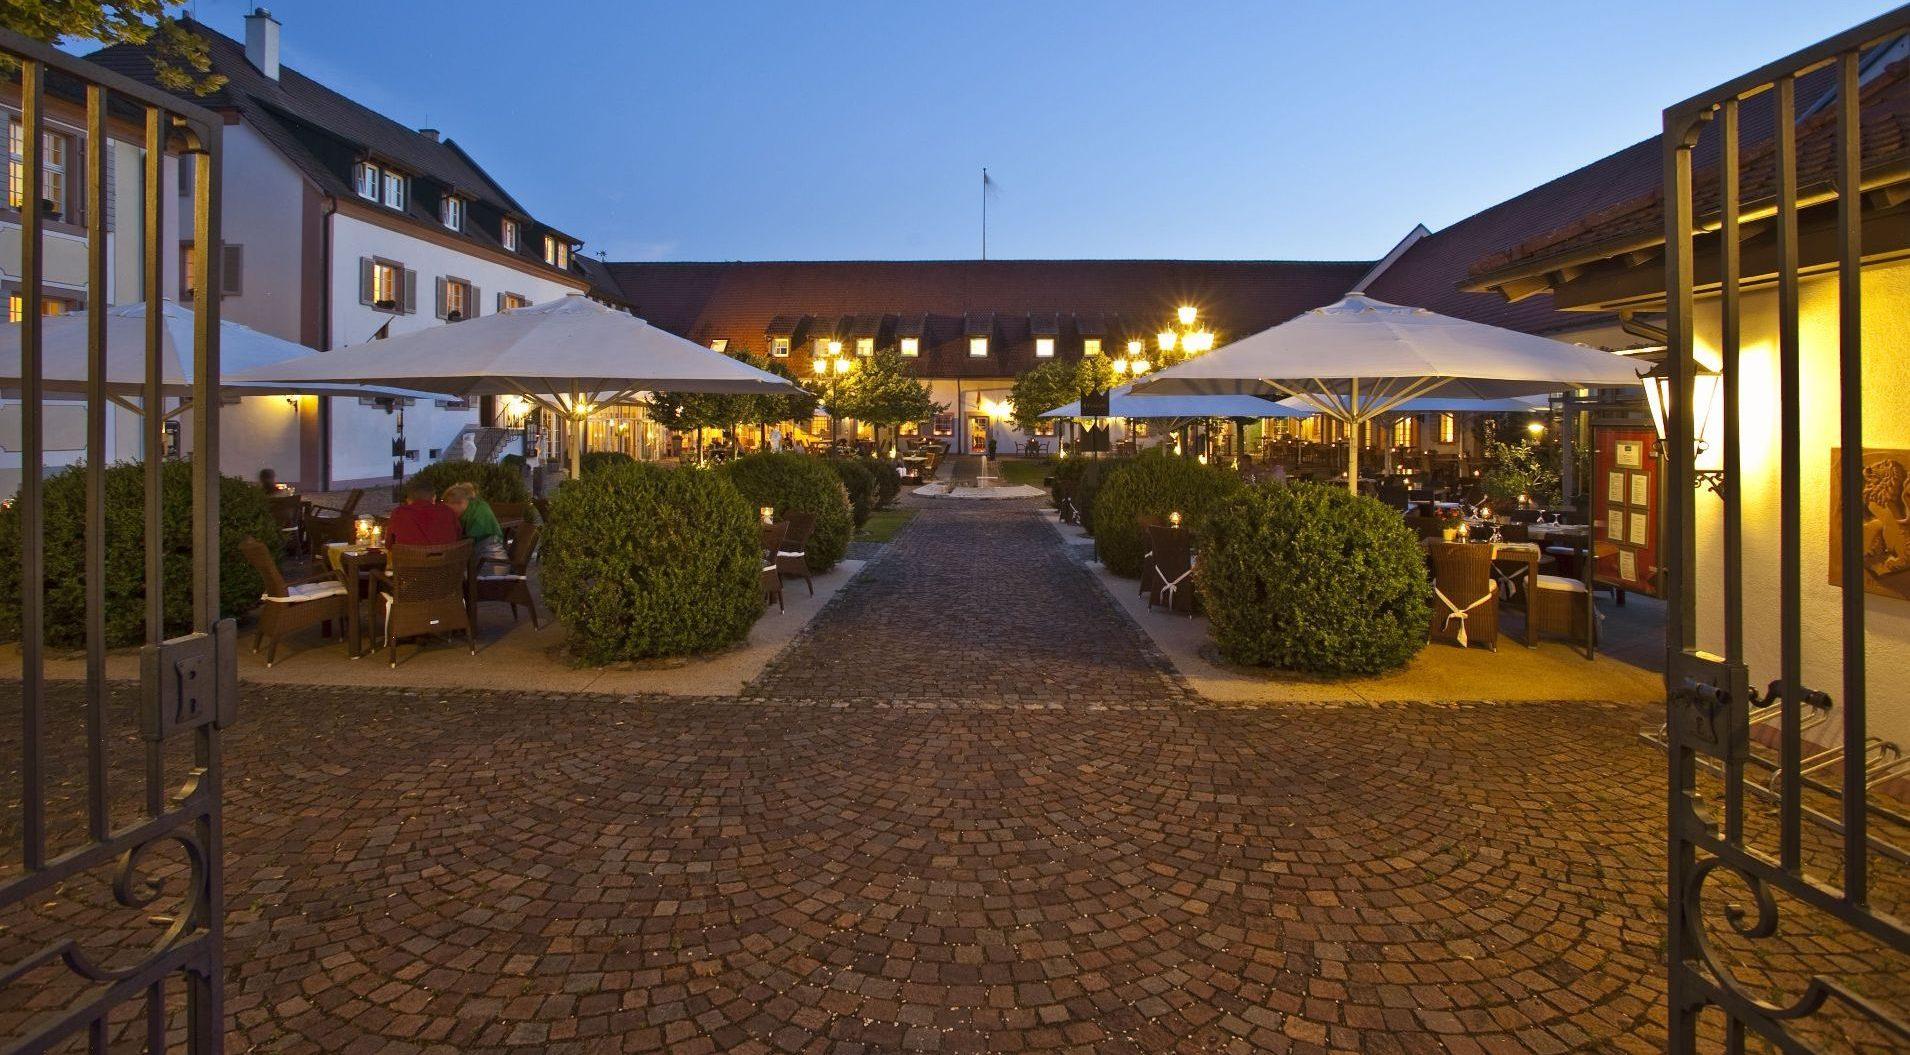 sHerrehus in Freiburg im Breisgau